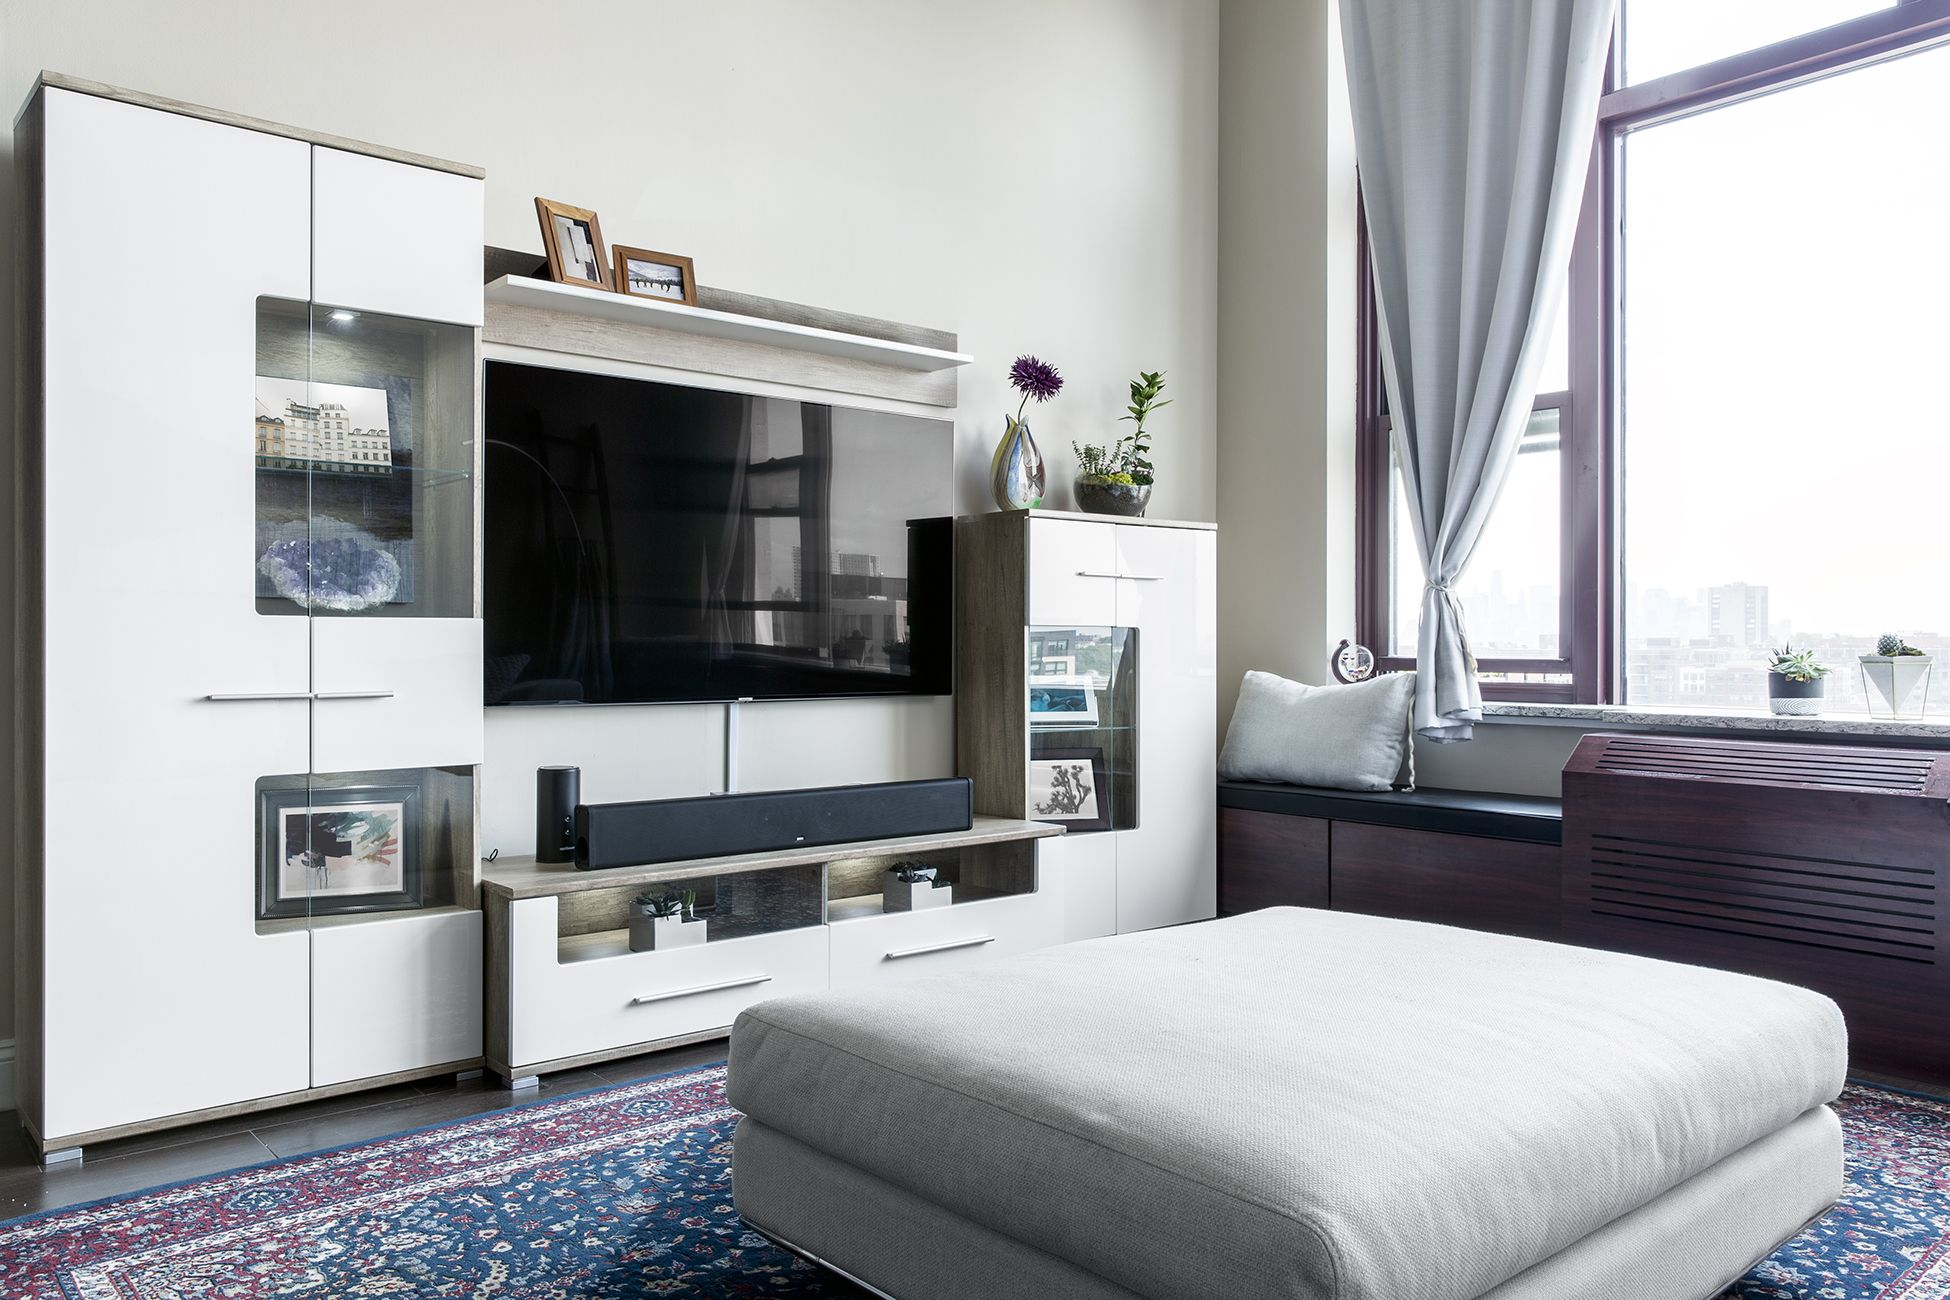 Loft Interior Design Entertainment Center Ideas Tv Display Décor Aid